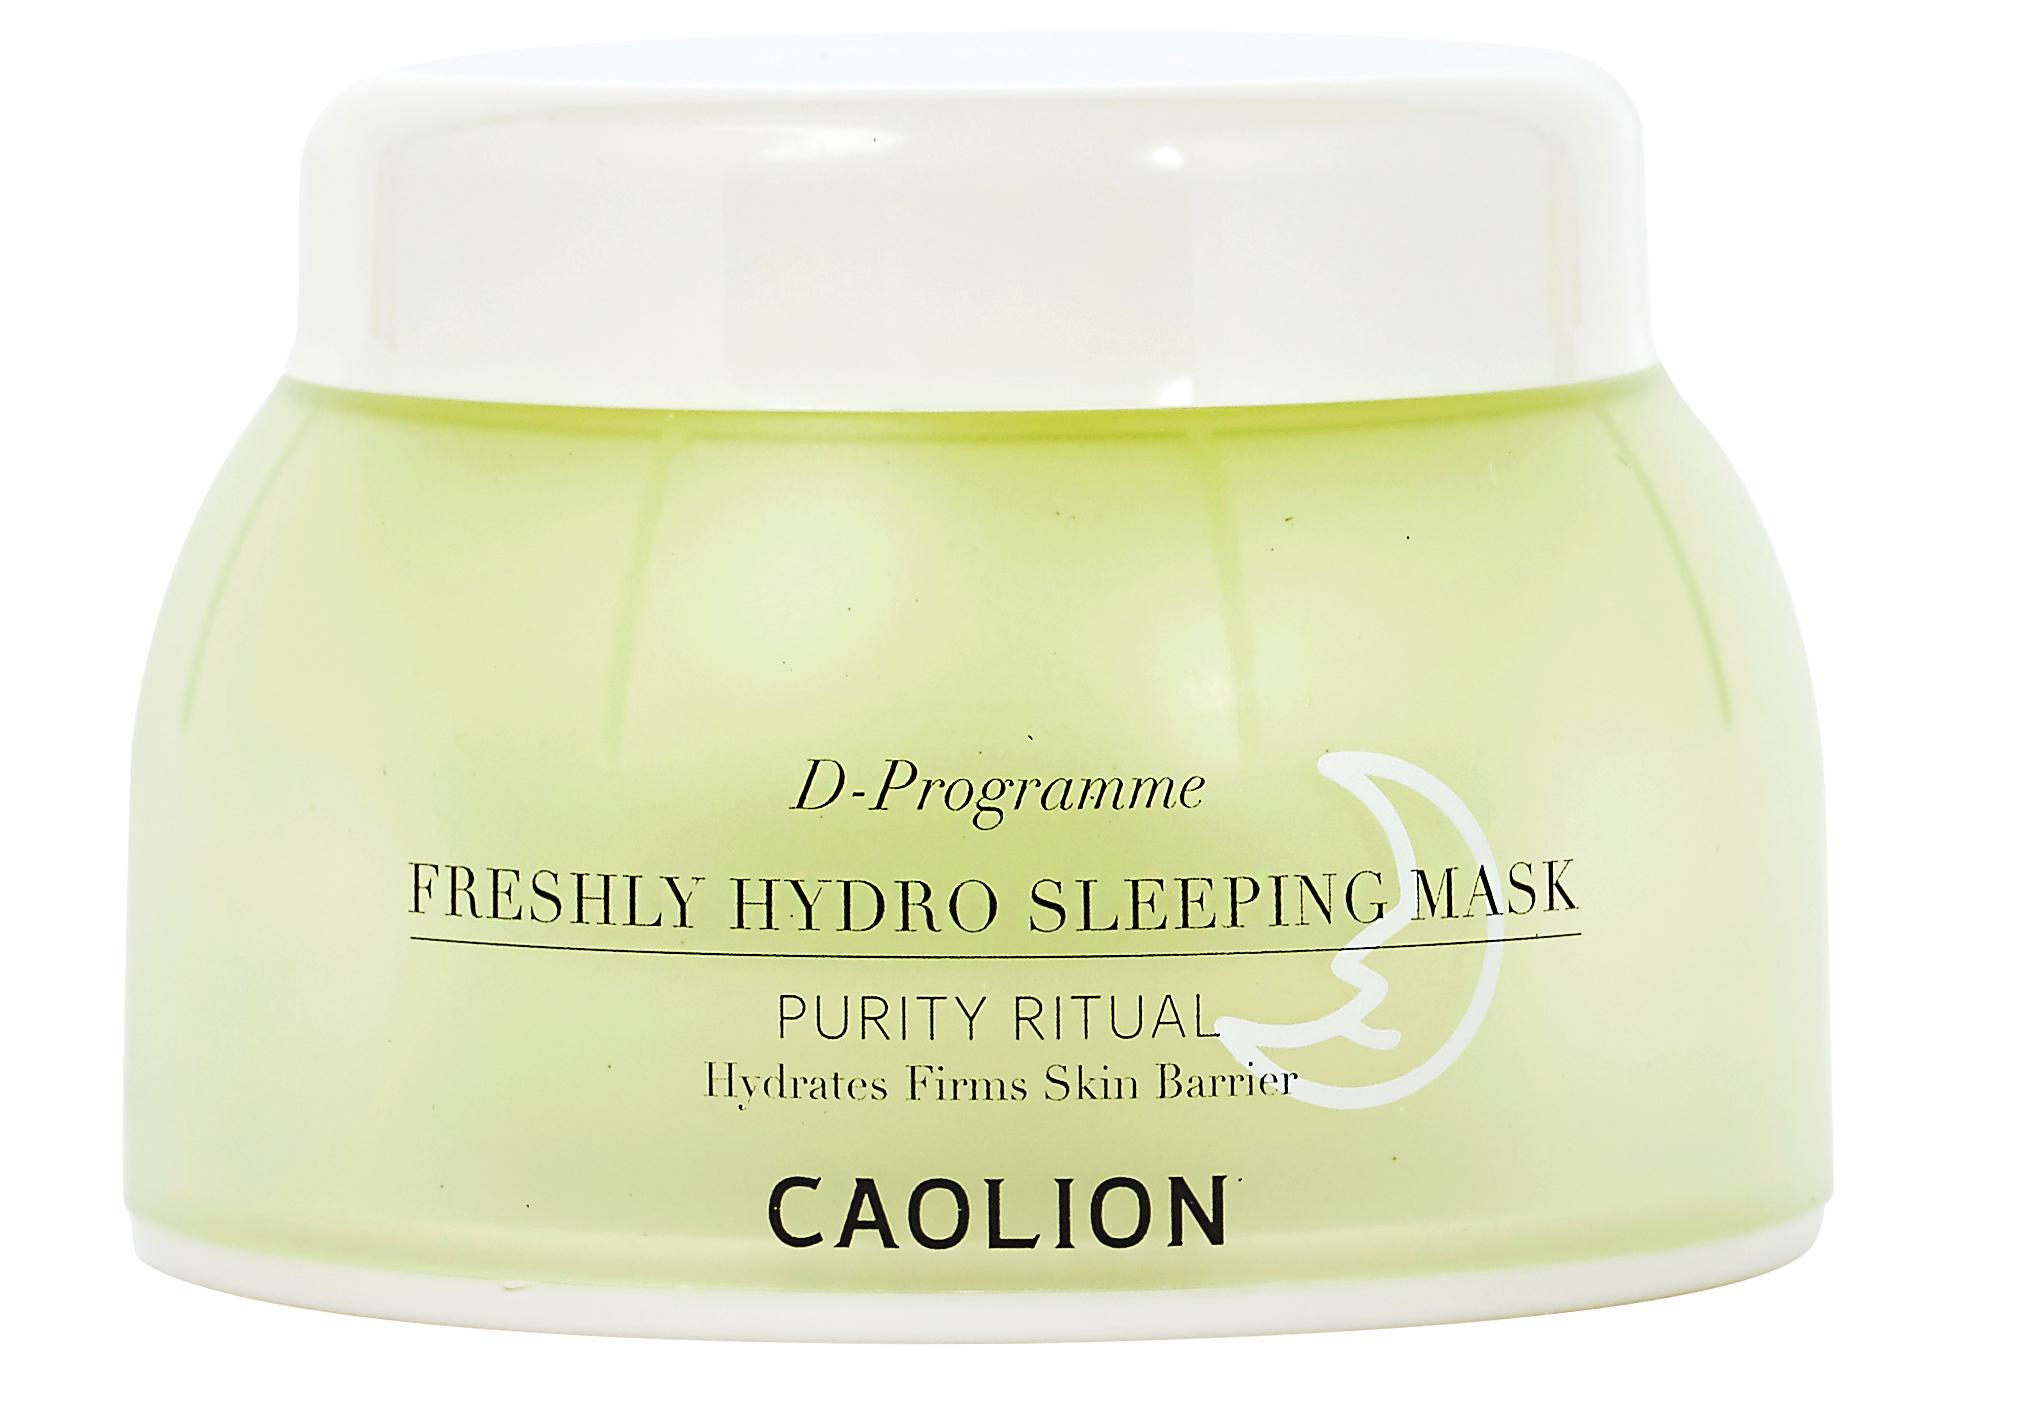 Caolion Freshly Hydro Sleeping Mask